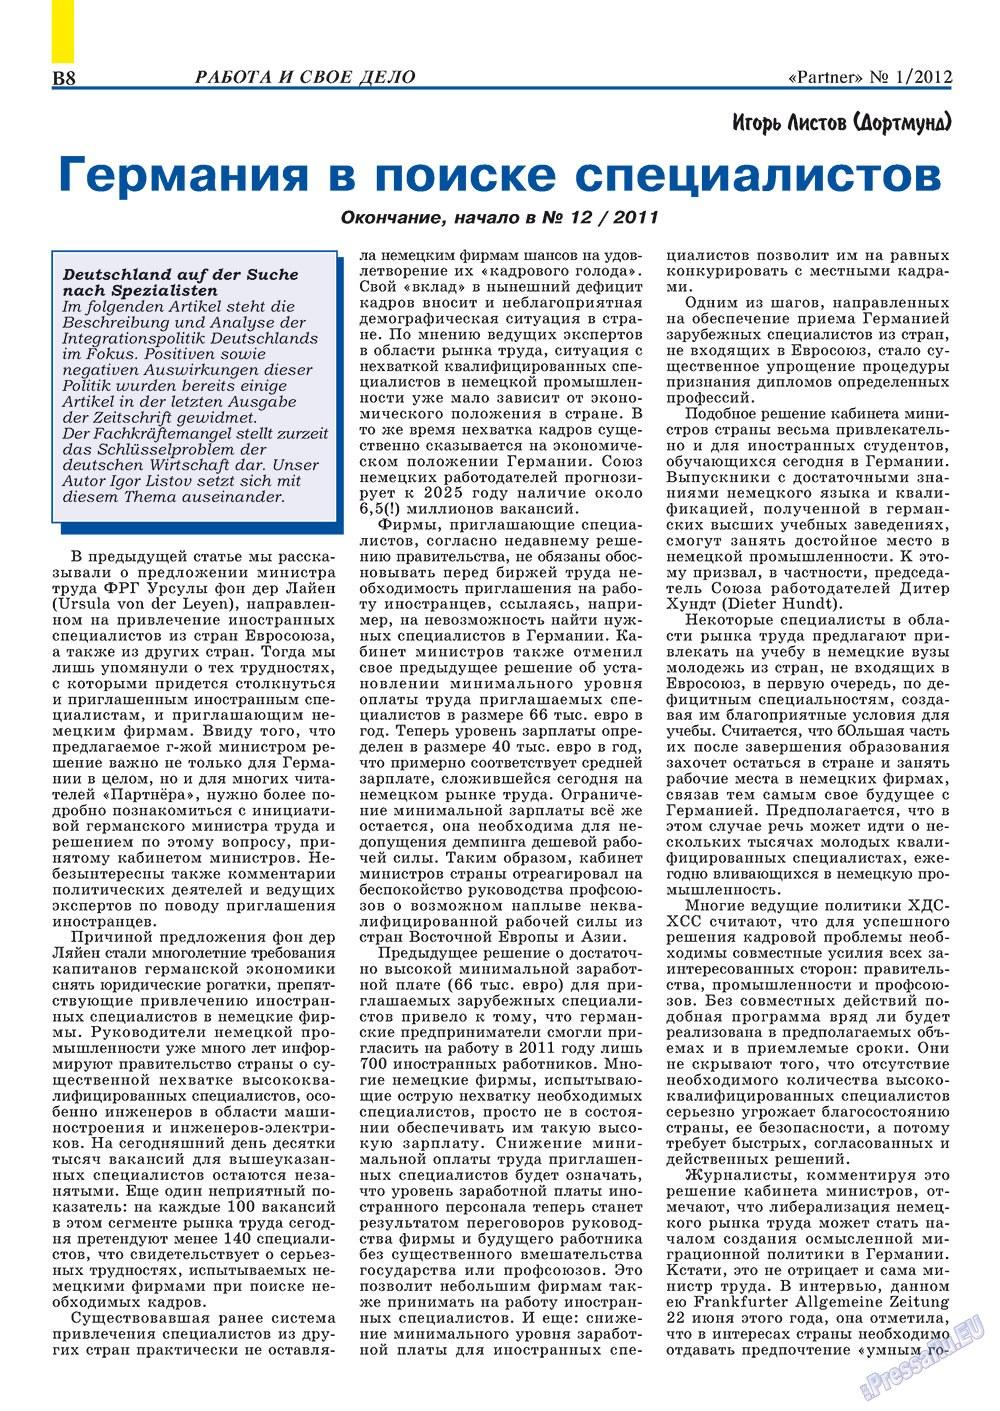 Партнер-север (журнал). 2012 год, номер 1, стр. 18